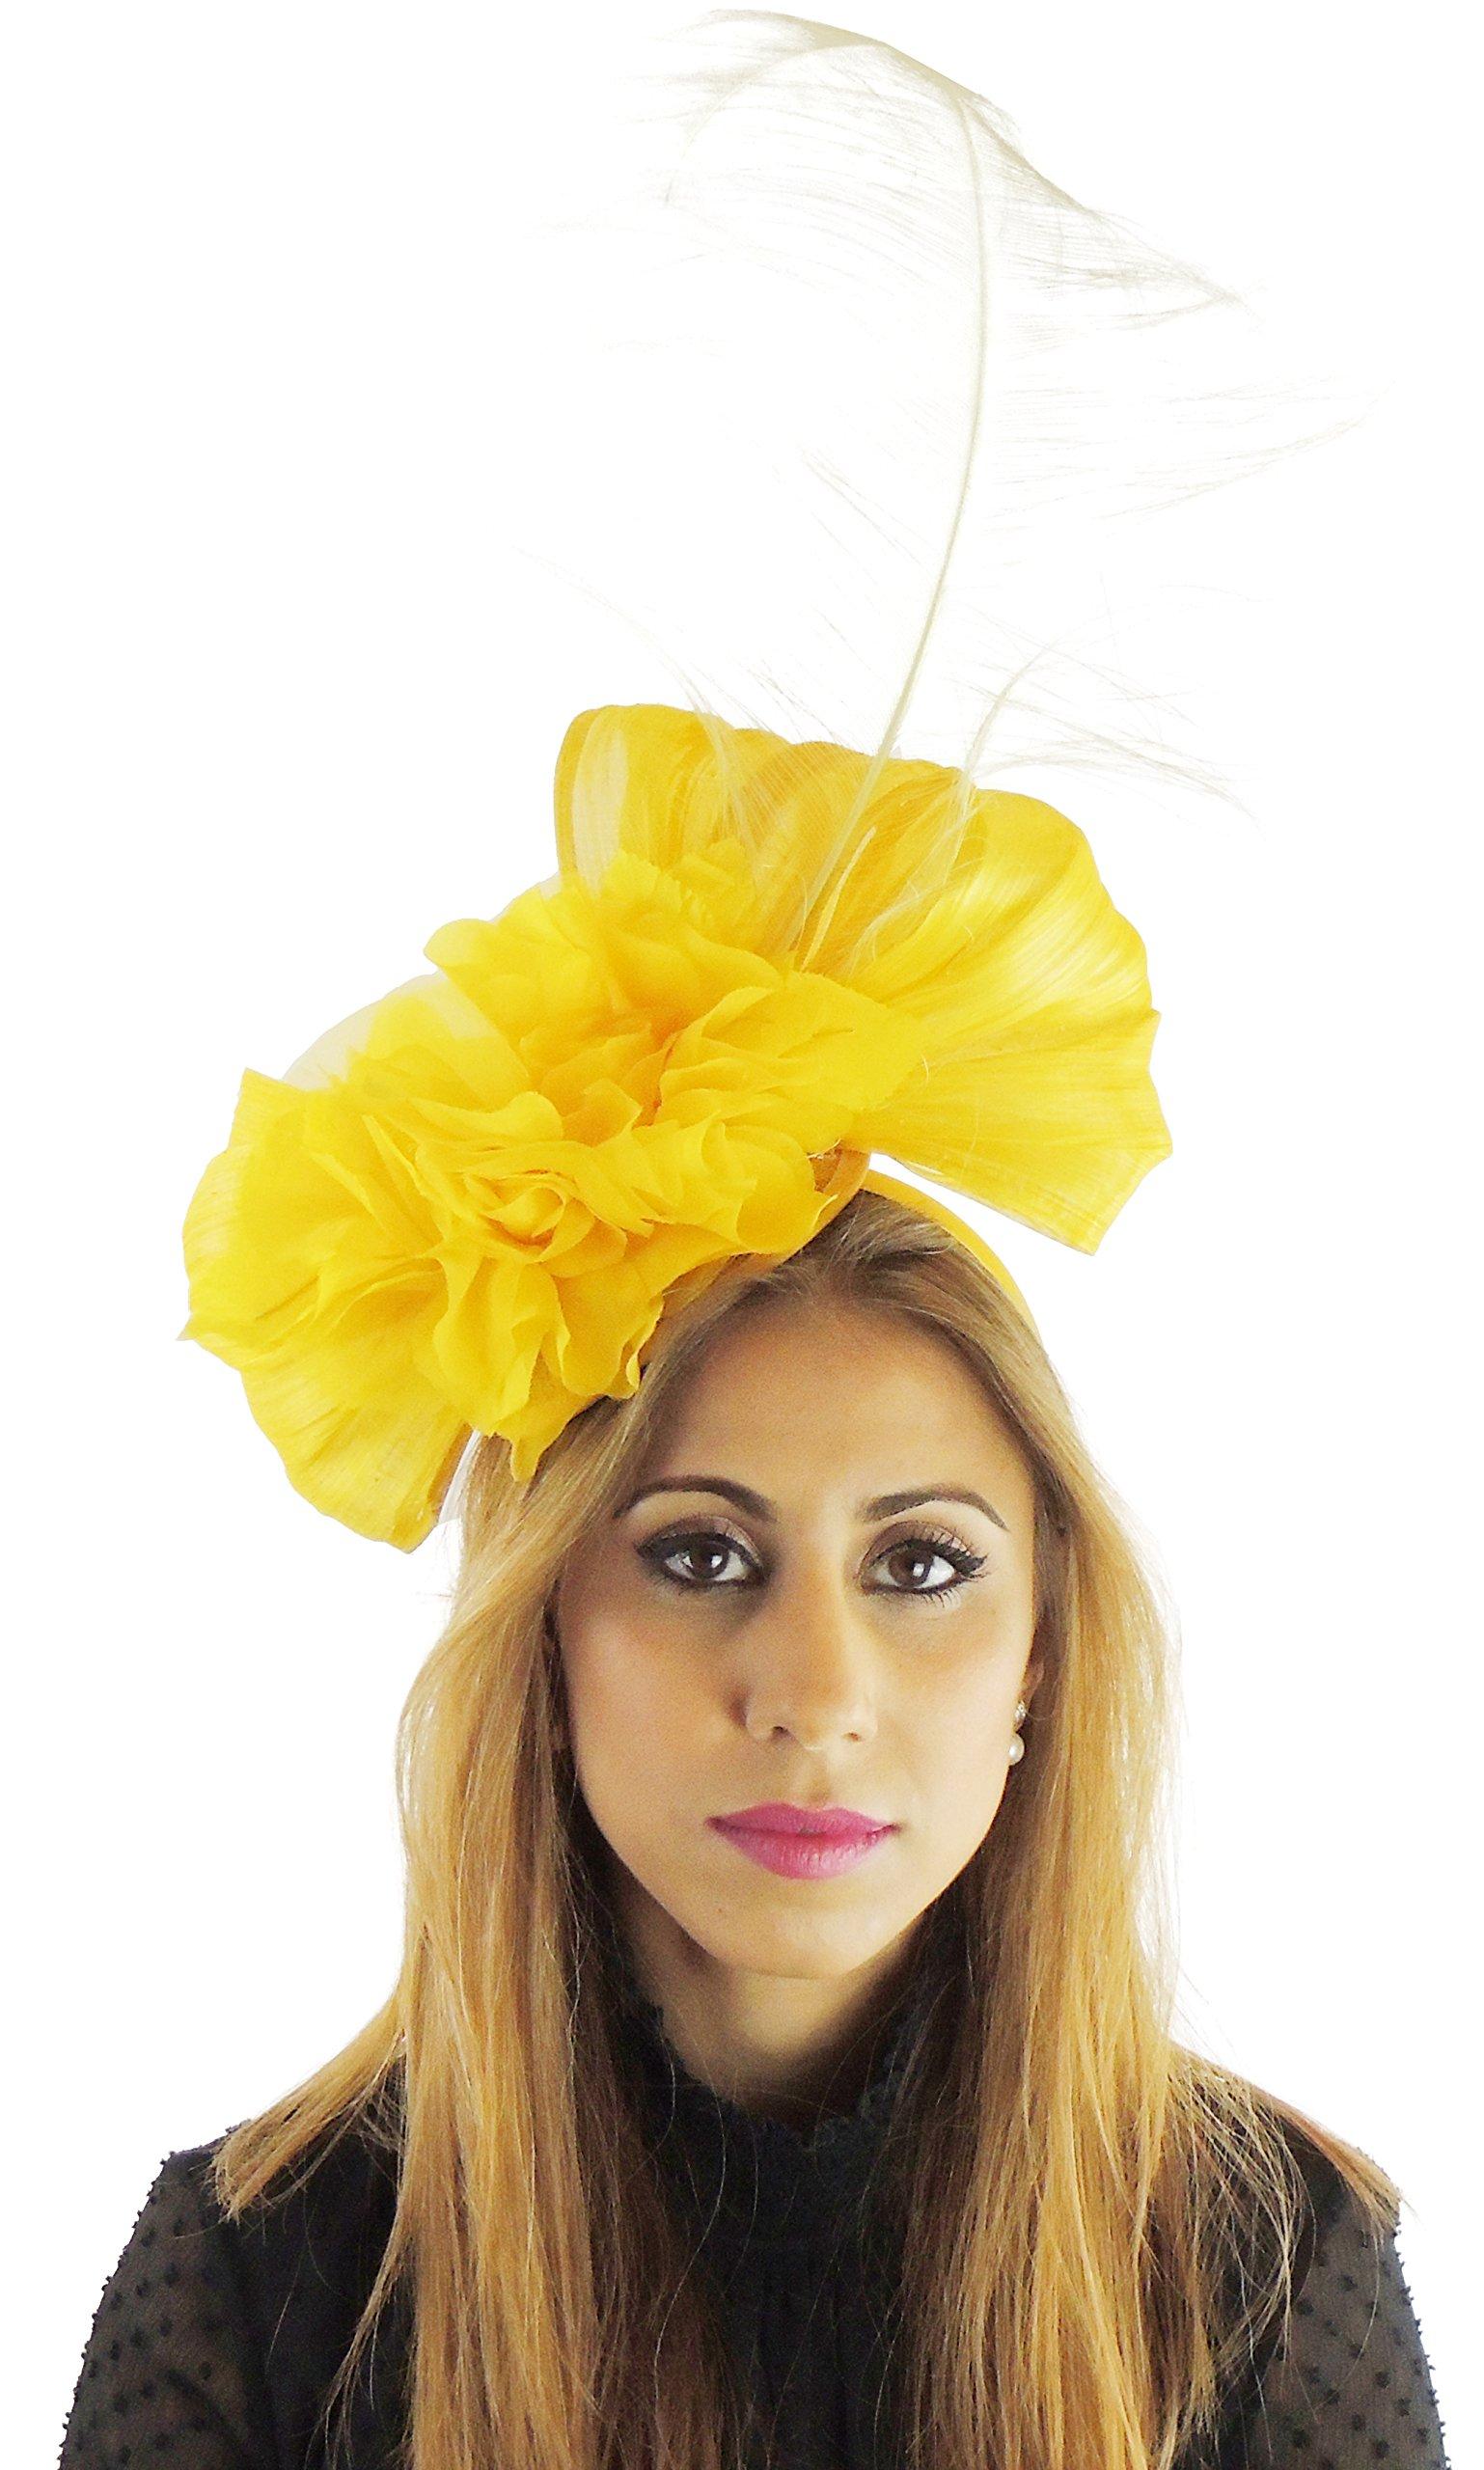 Hats By Cressida Silk Sinamay & Silk Flower Elegant Ladies Ascot Wedding Fascinator Yellow by Hats By Cressida